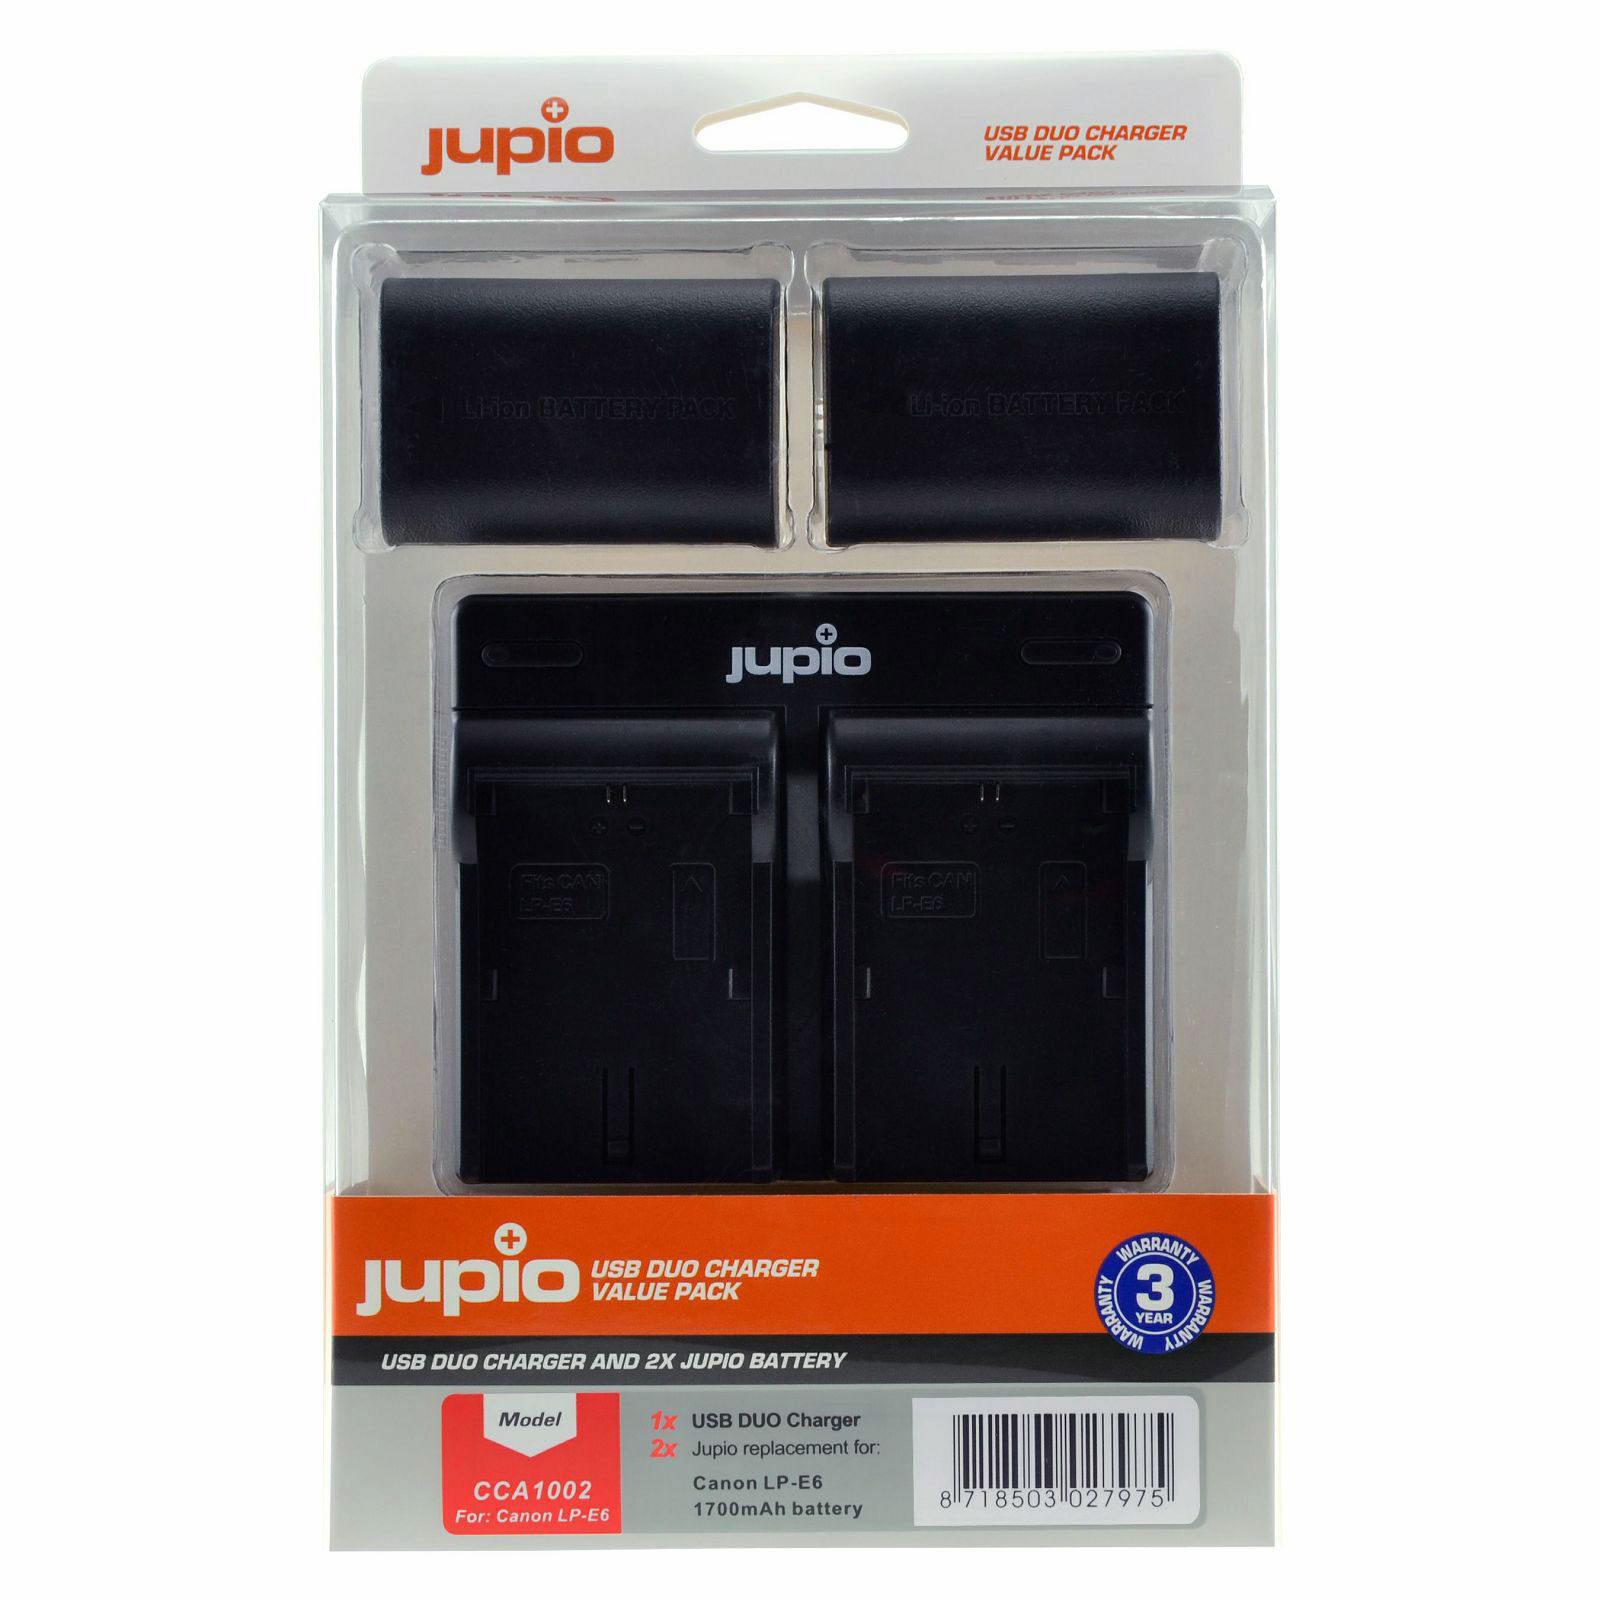 Foto van Canon LP-E6 USB Duo Charger Kit (Merk Jupio)